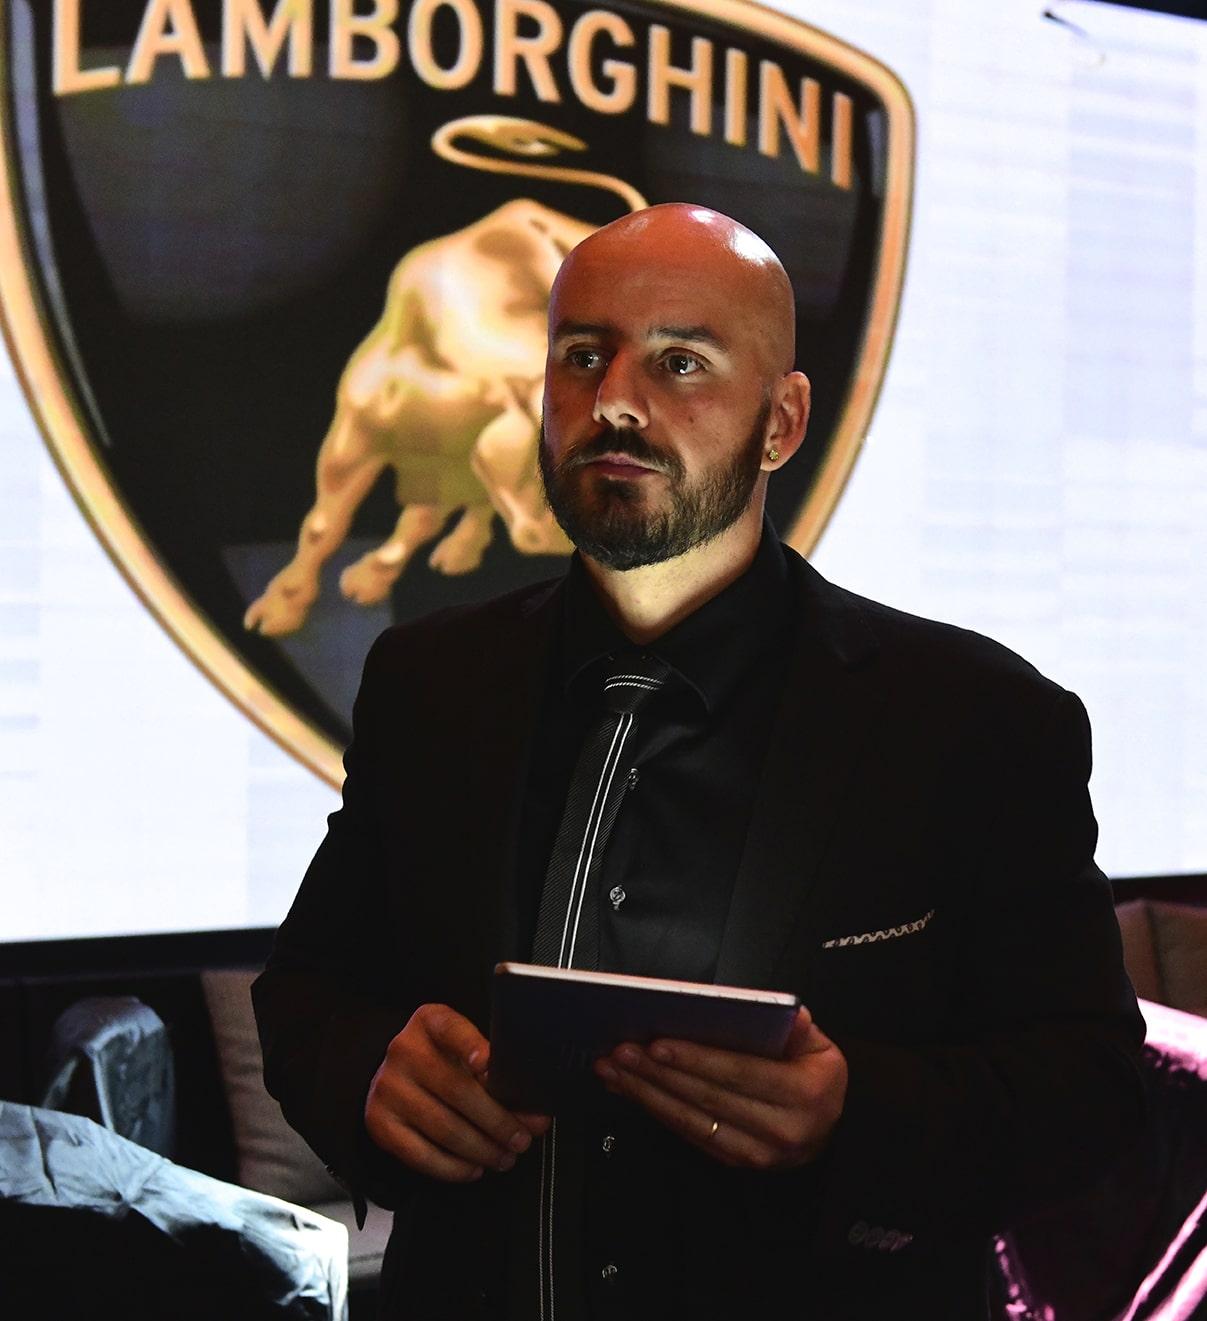 Stefano Cigana